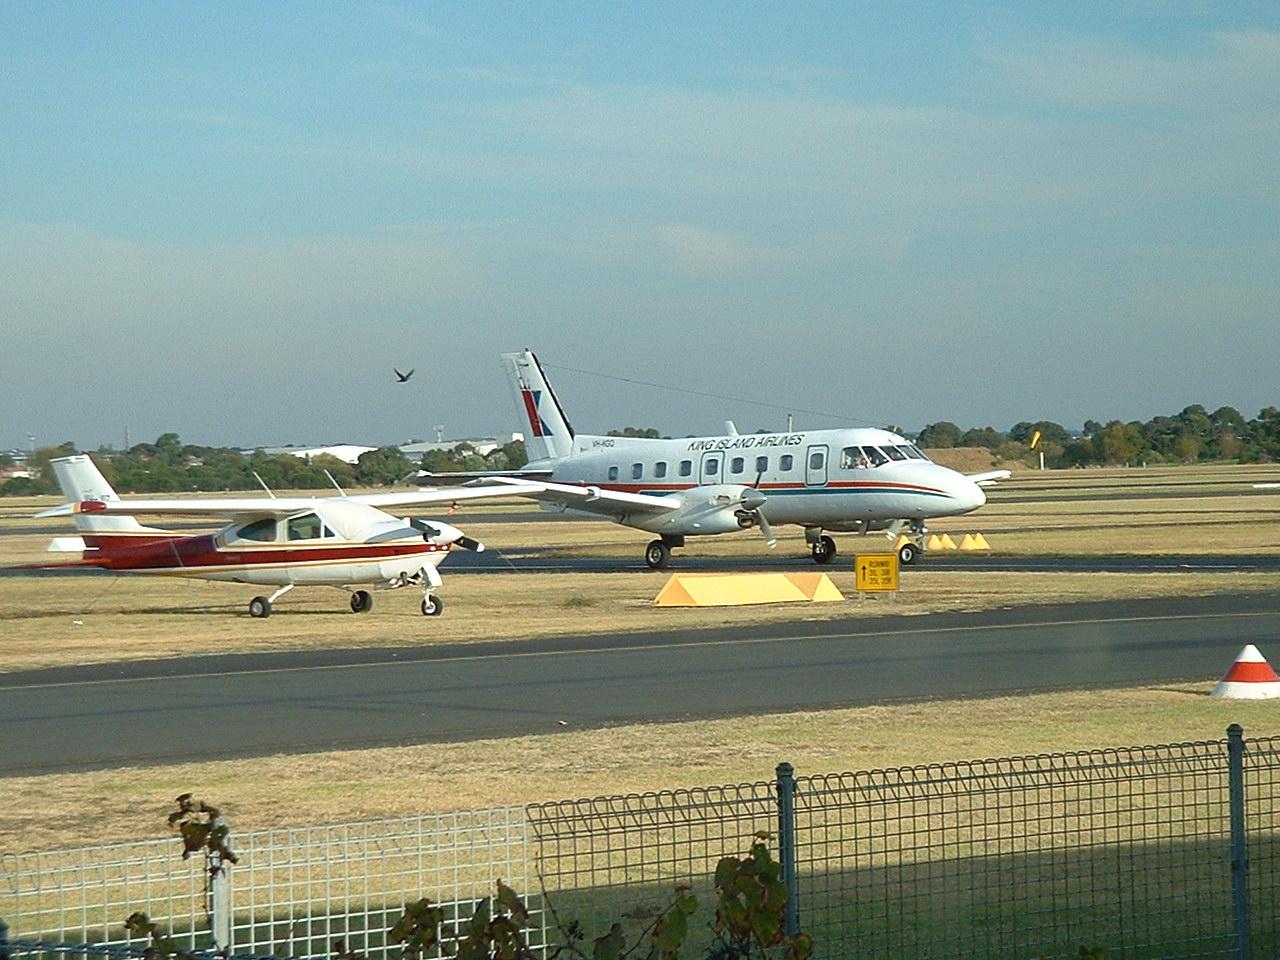 Moorabbin Australia  city pictures gallery : King Island plane at Moorabbin Wikimedia Commons